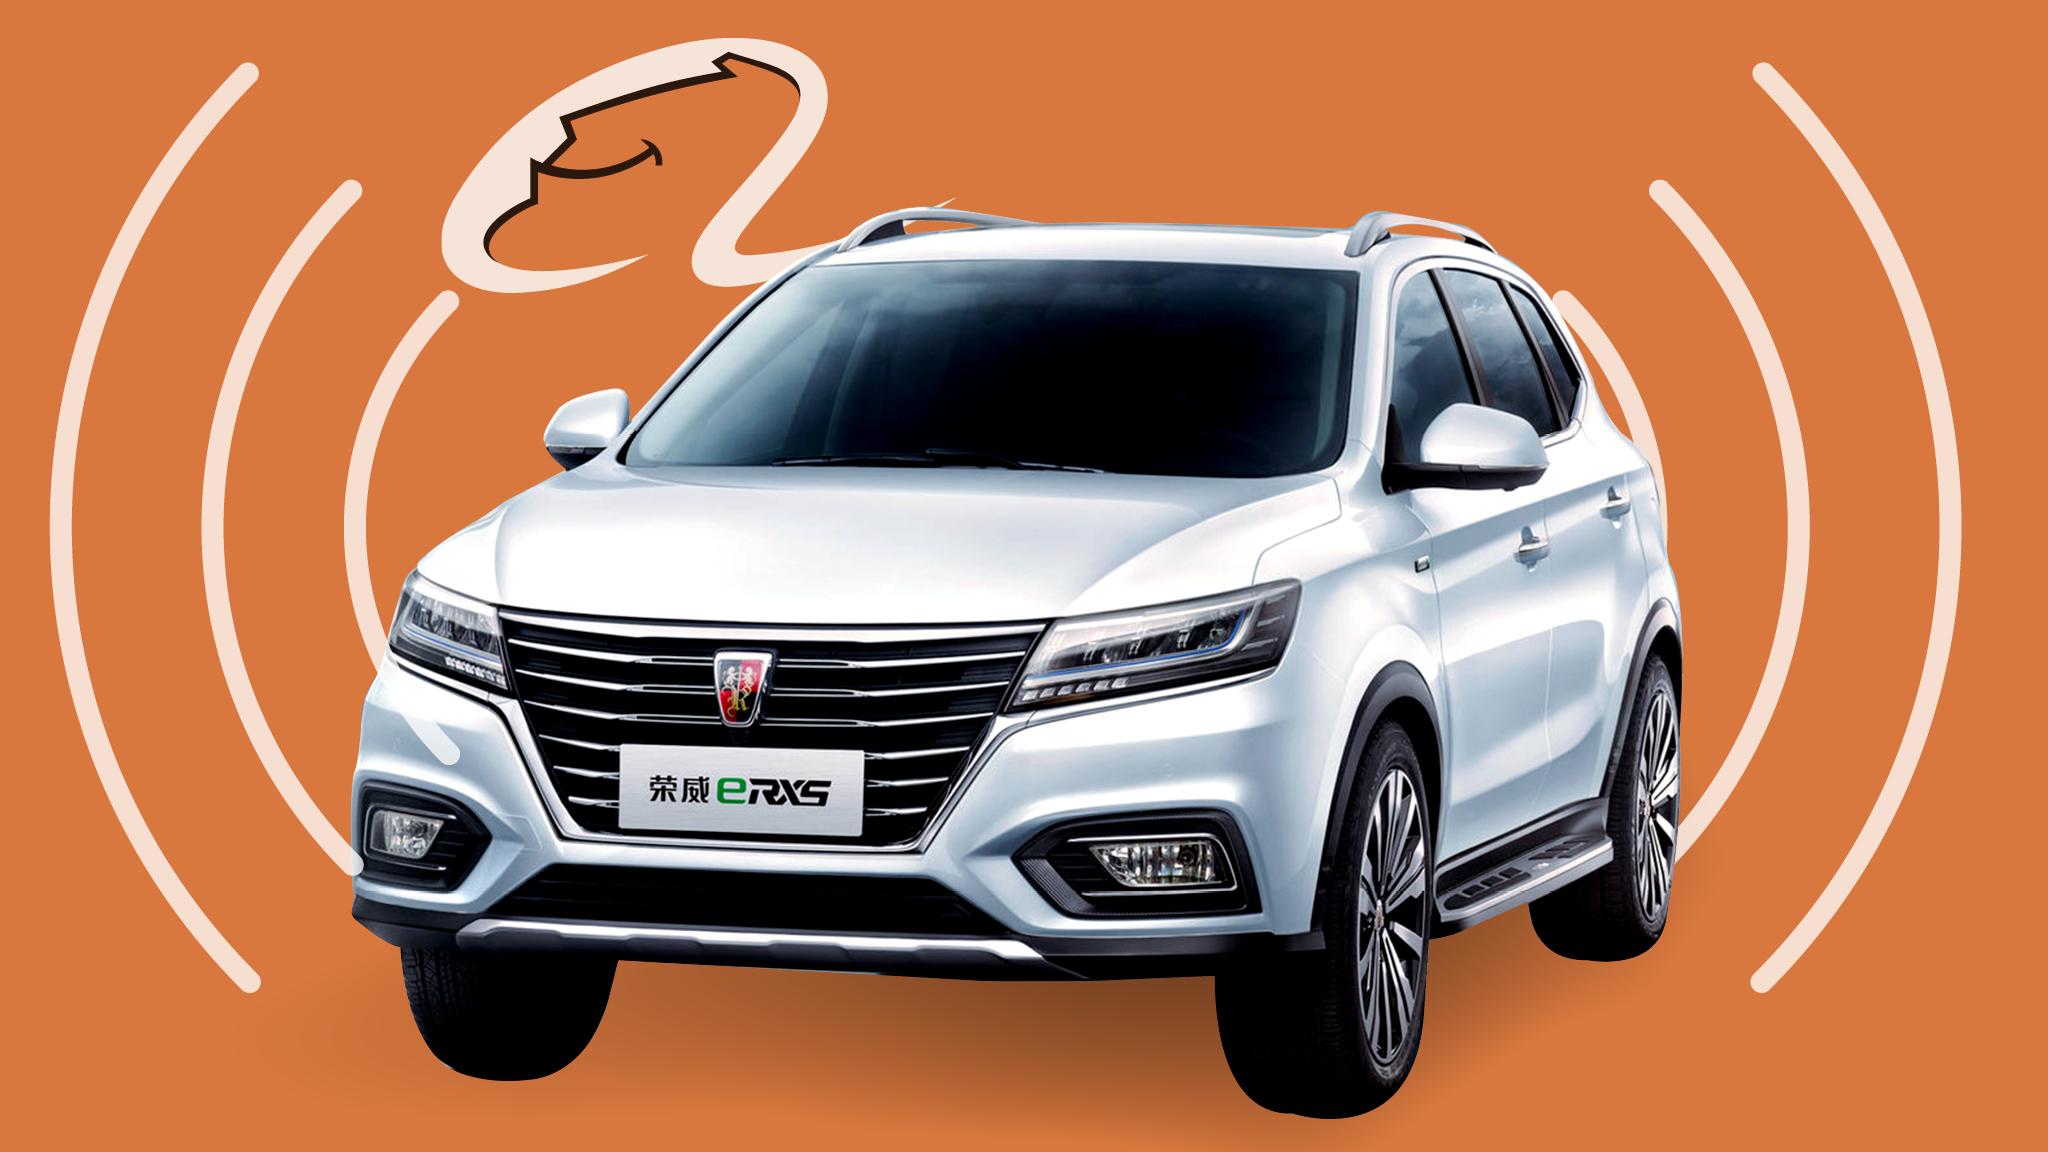 China s tech titans set sights on car innovation